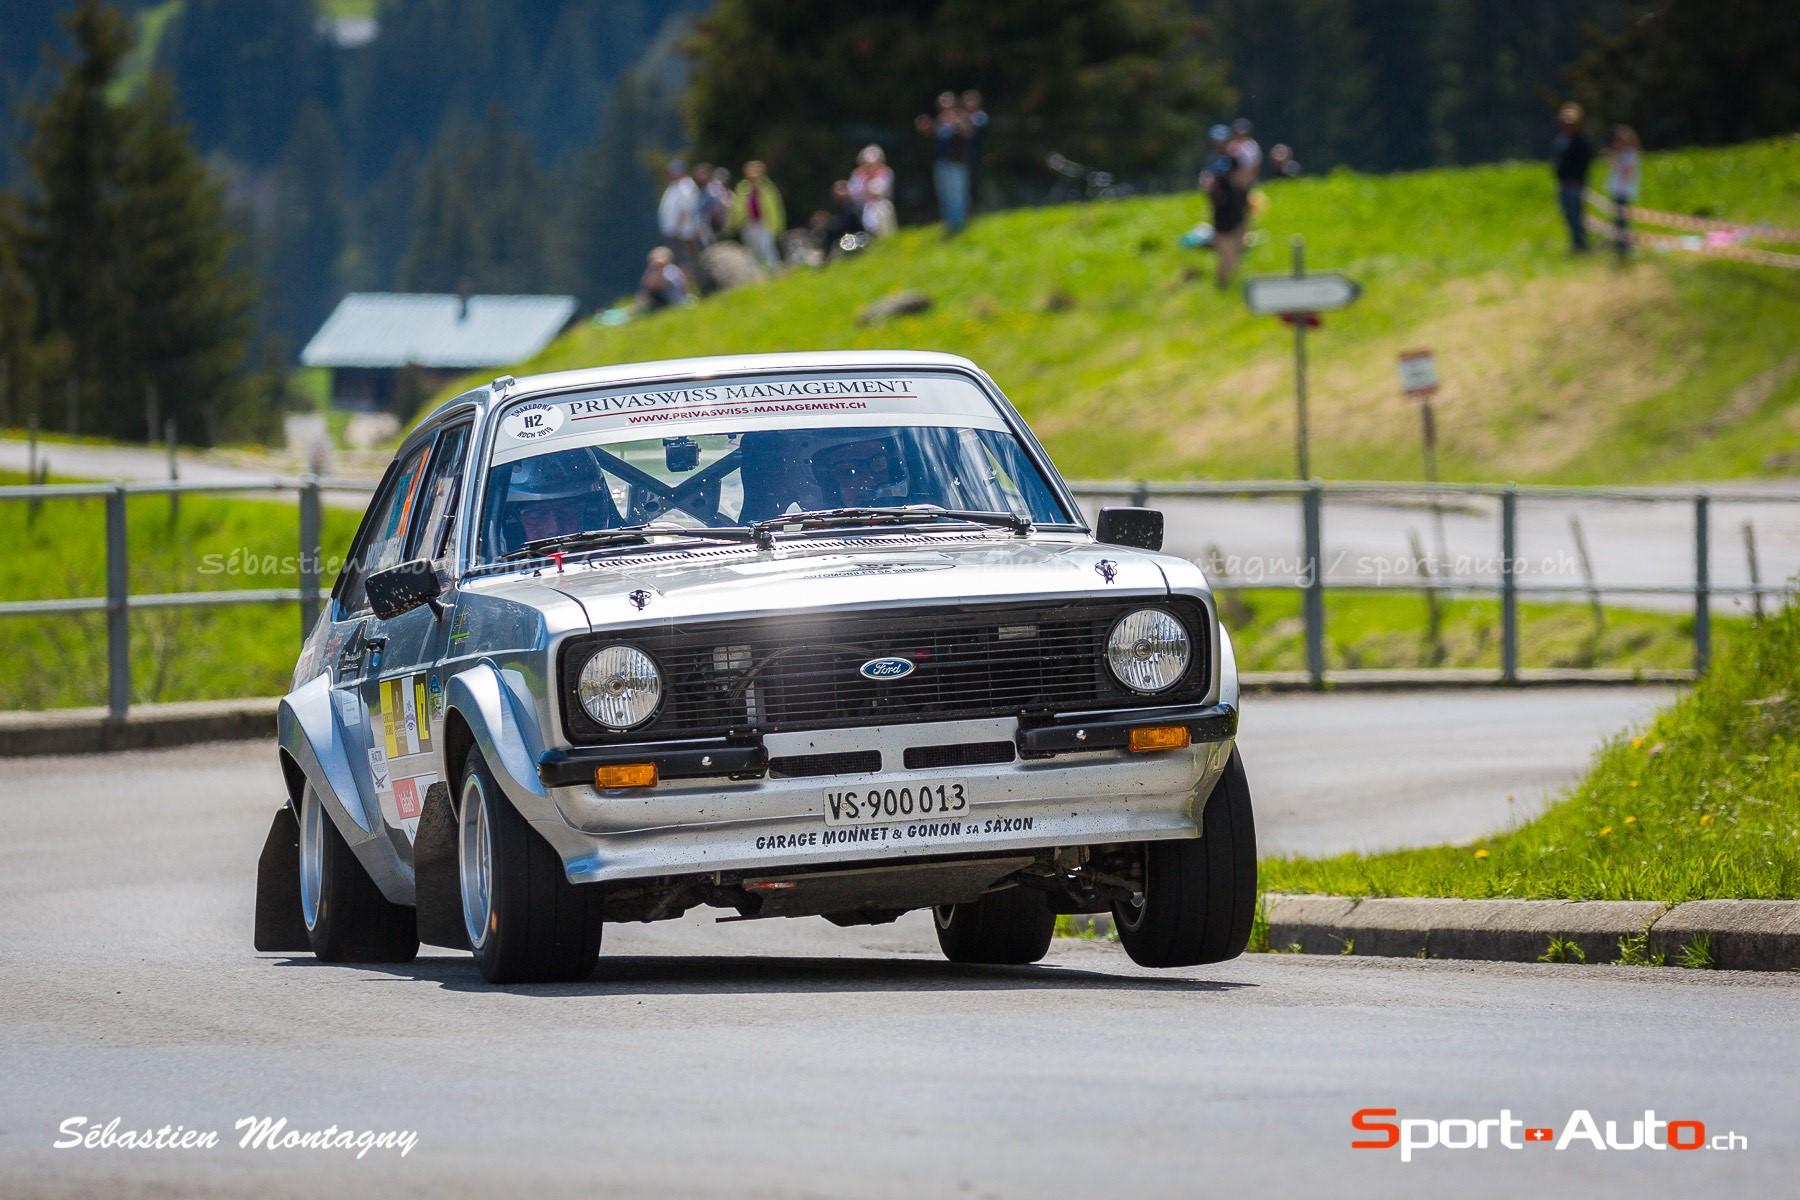 Rallye VHC : Quelques apparitions de Florian Gonon en 2020